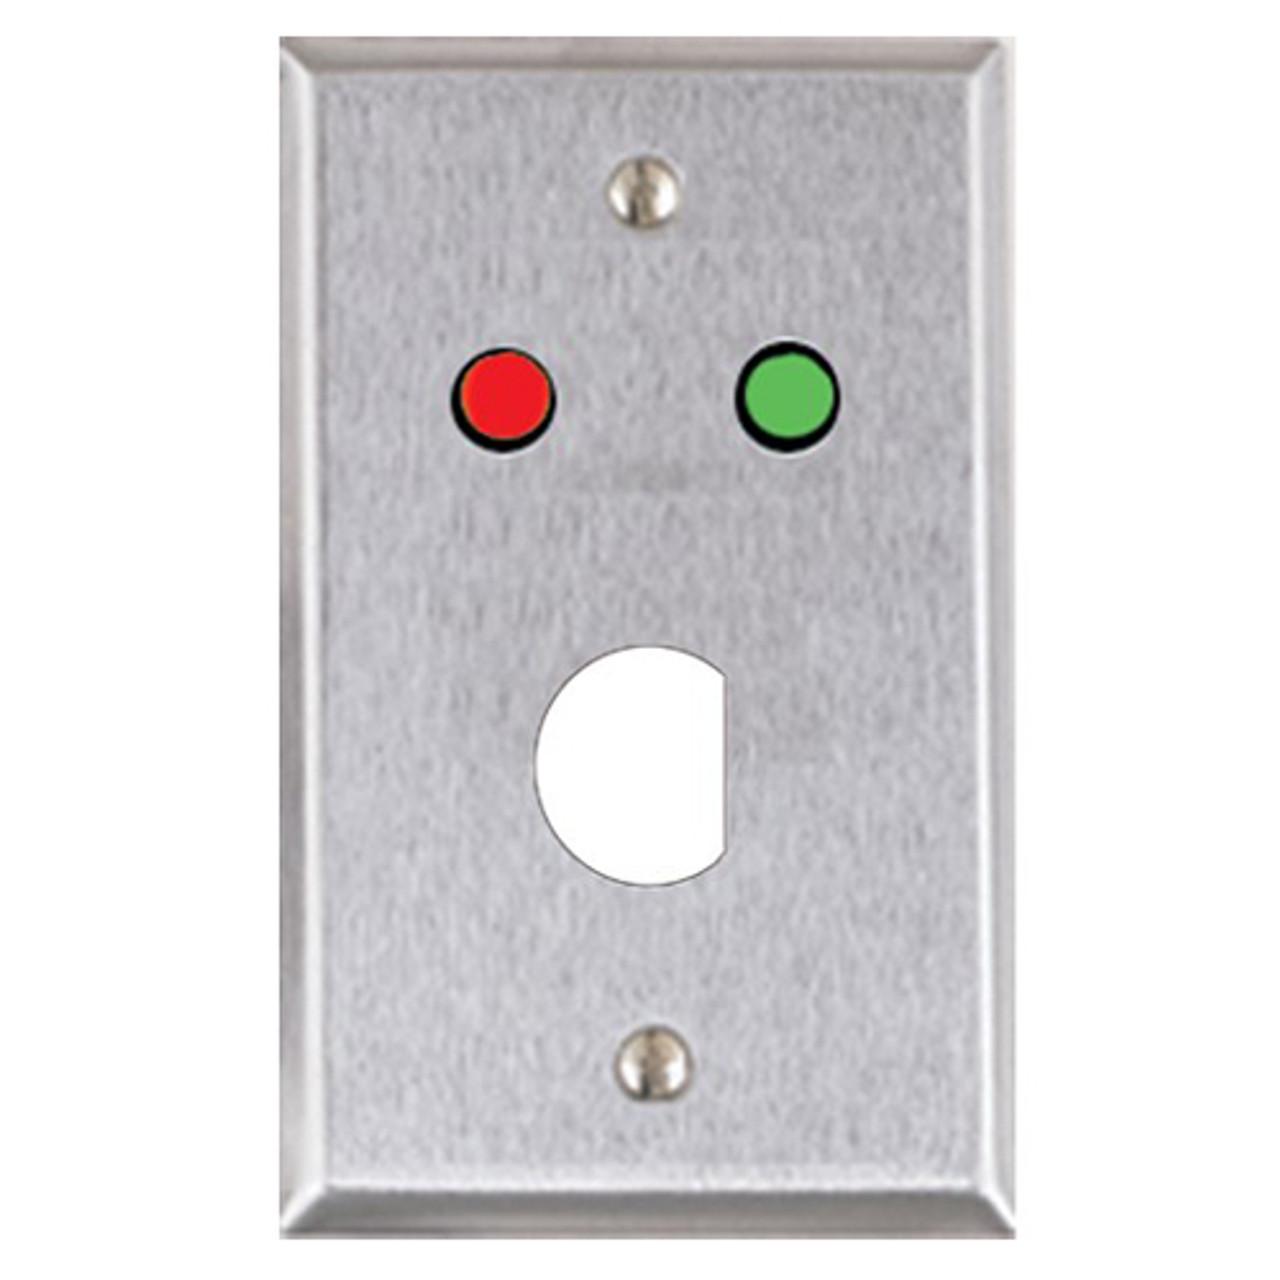 ASP-RP-4 ASP Alarm Control Single Gang Wall Plate